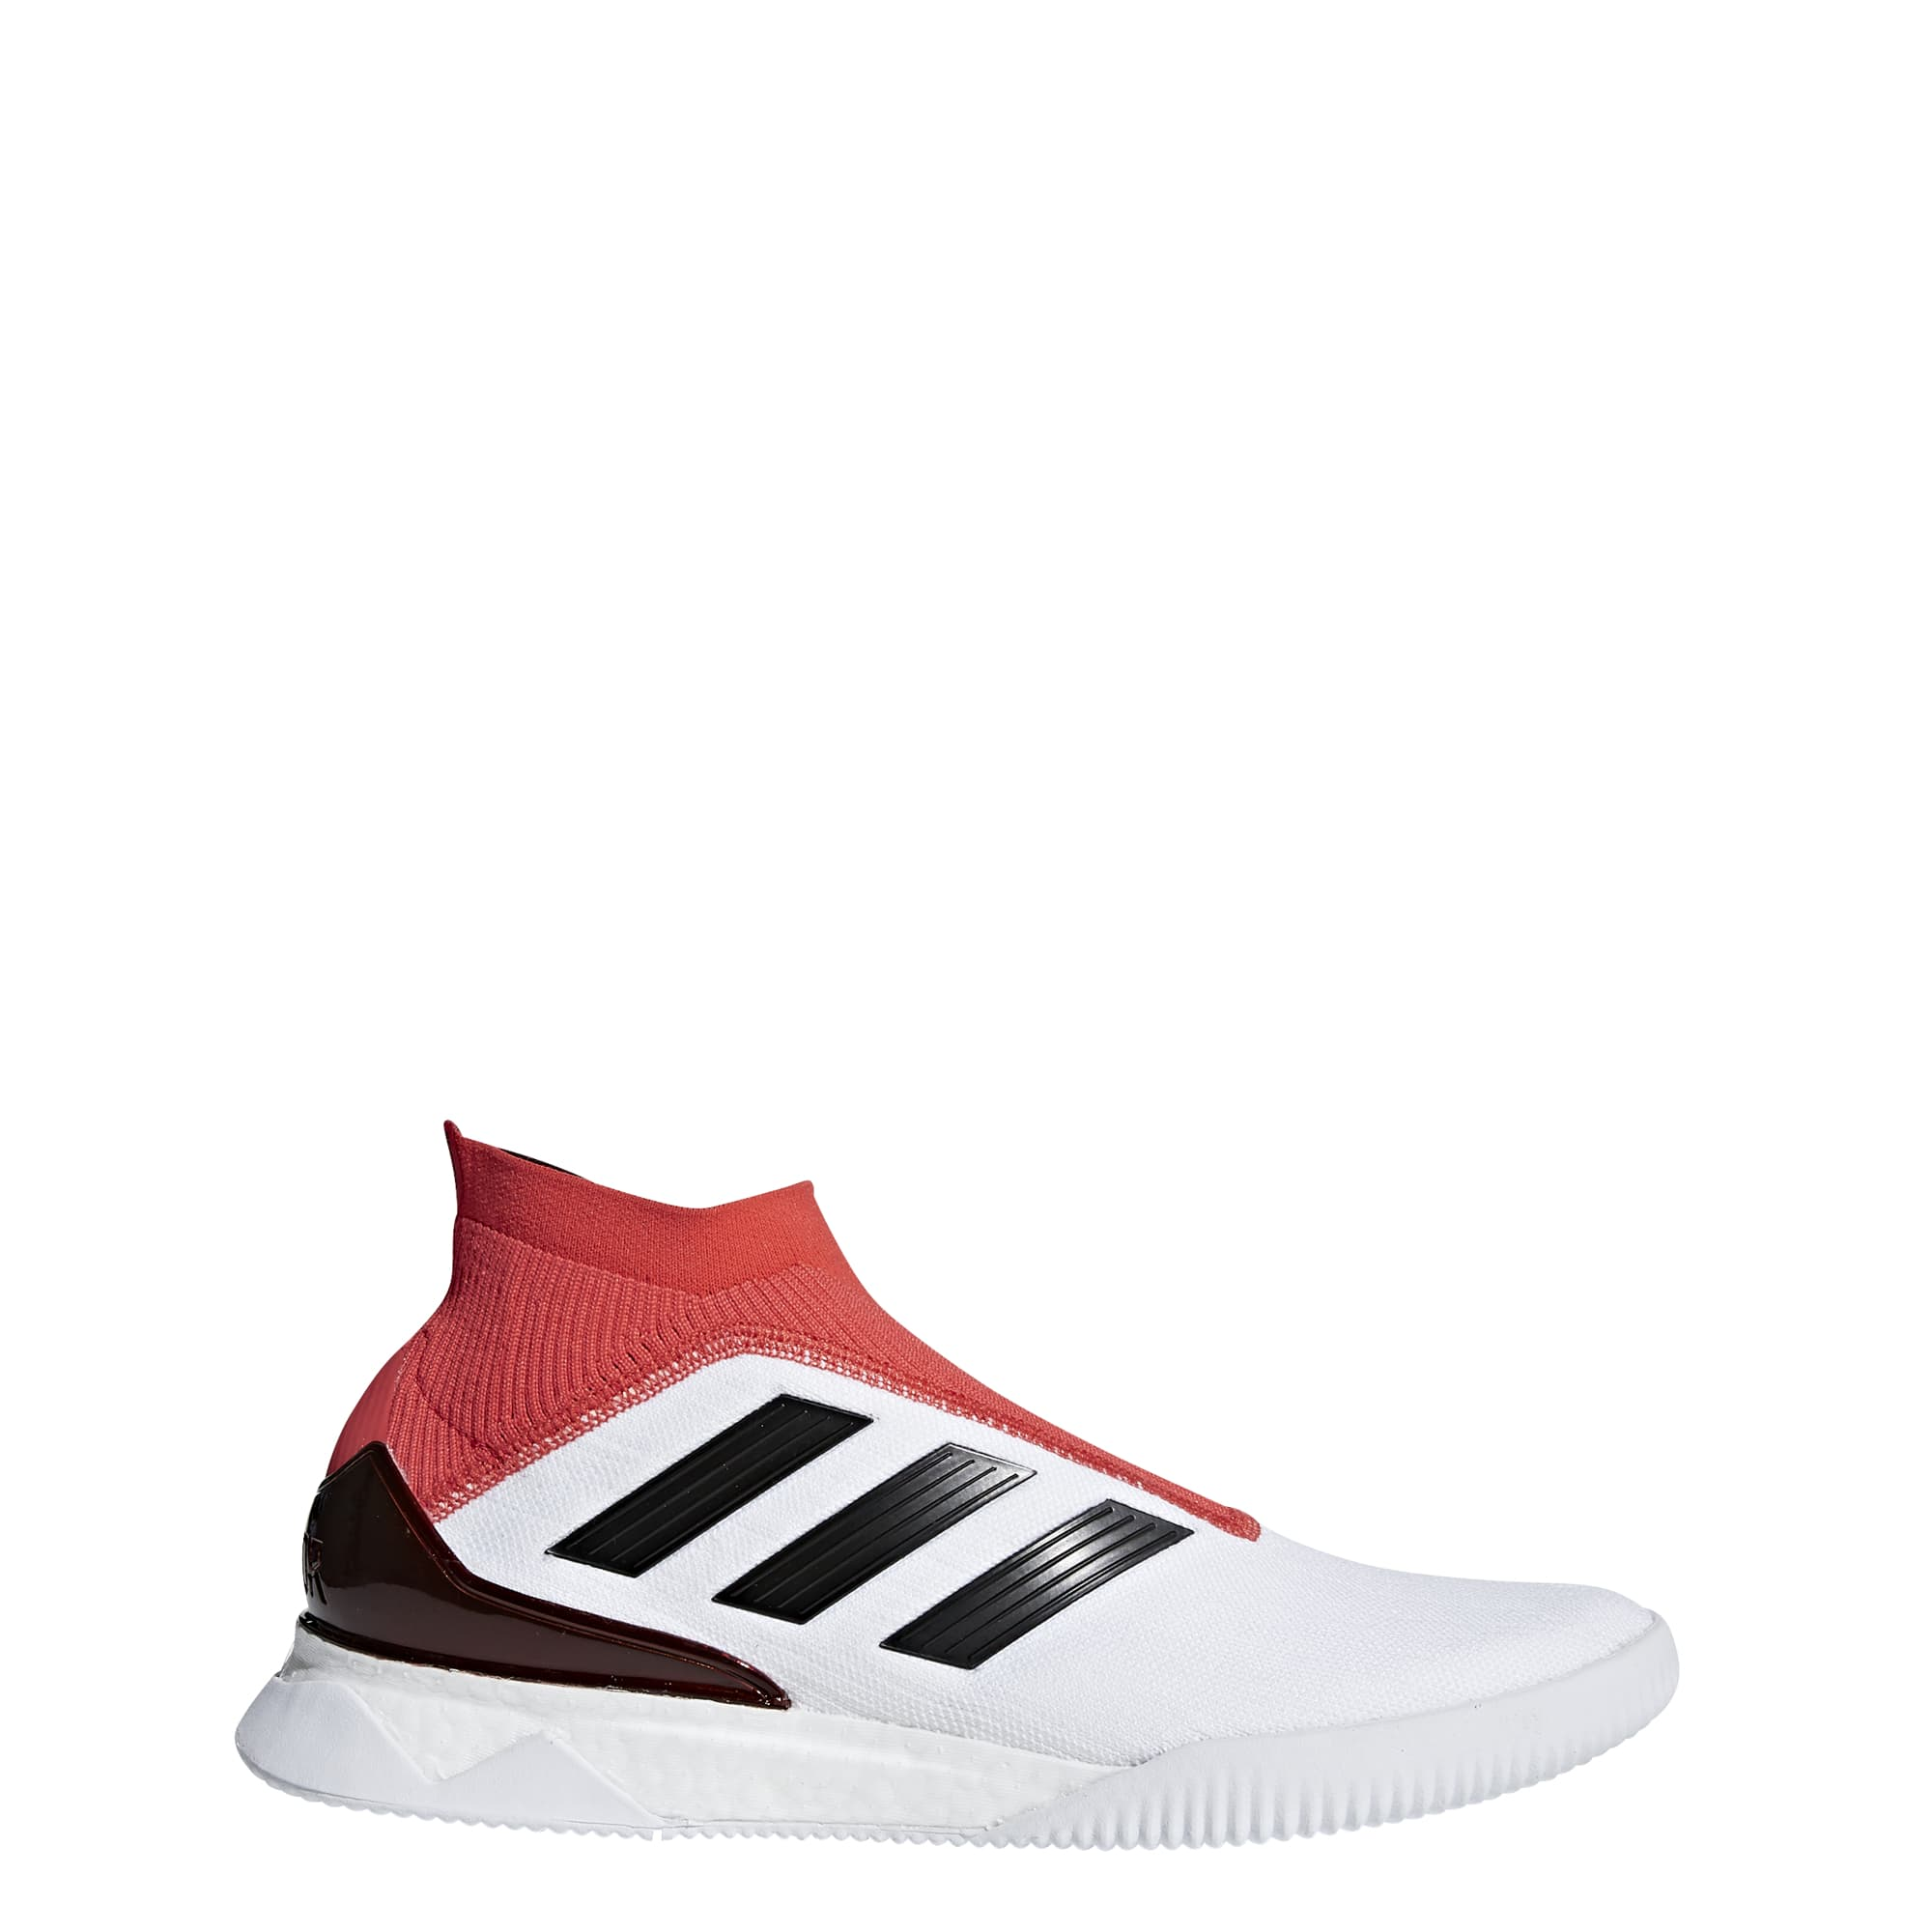 50761ed275b8 ... get adidas predator tango 18 trainers white core black real coral 77dff  7068d